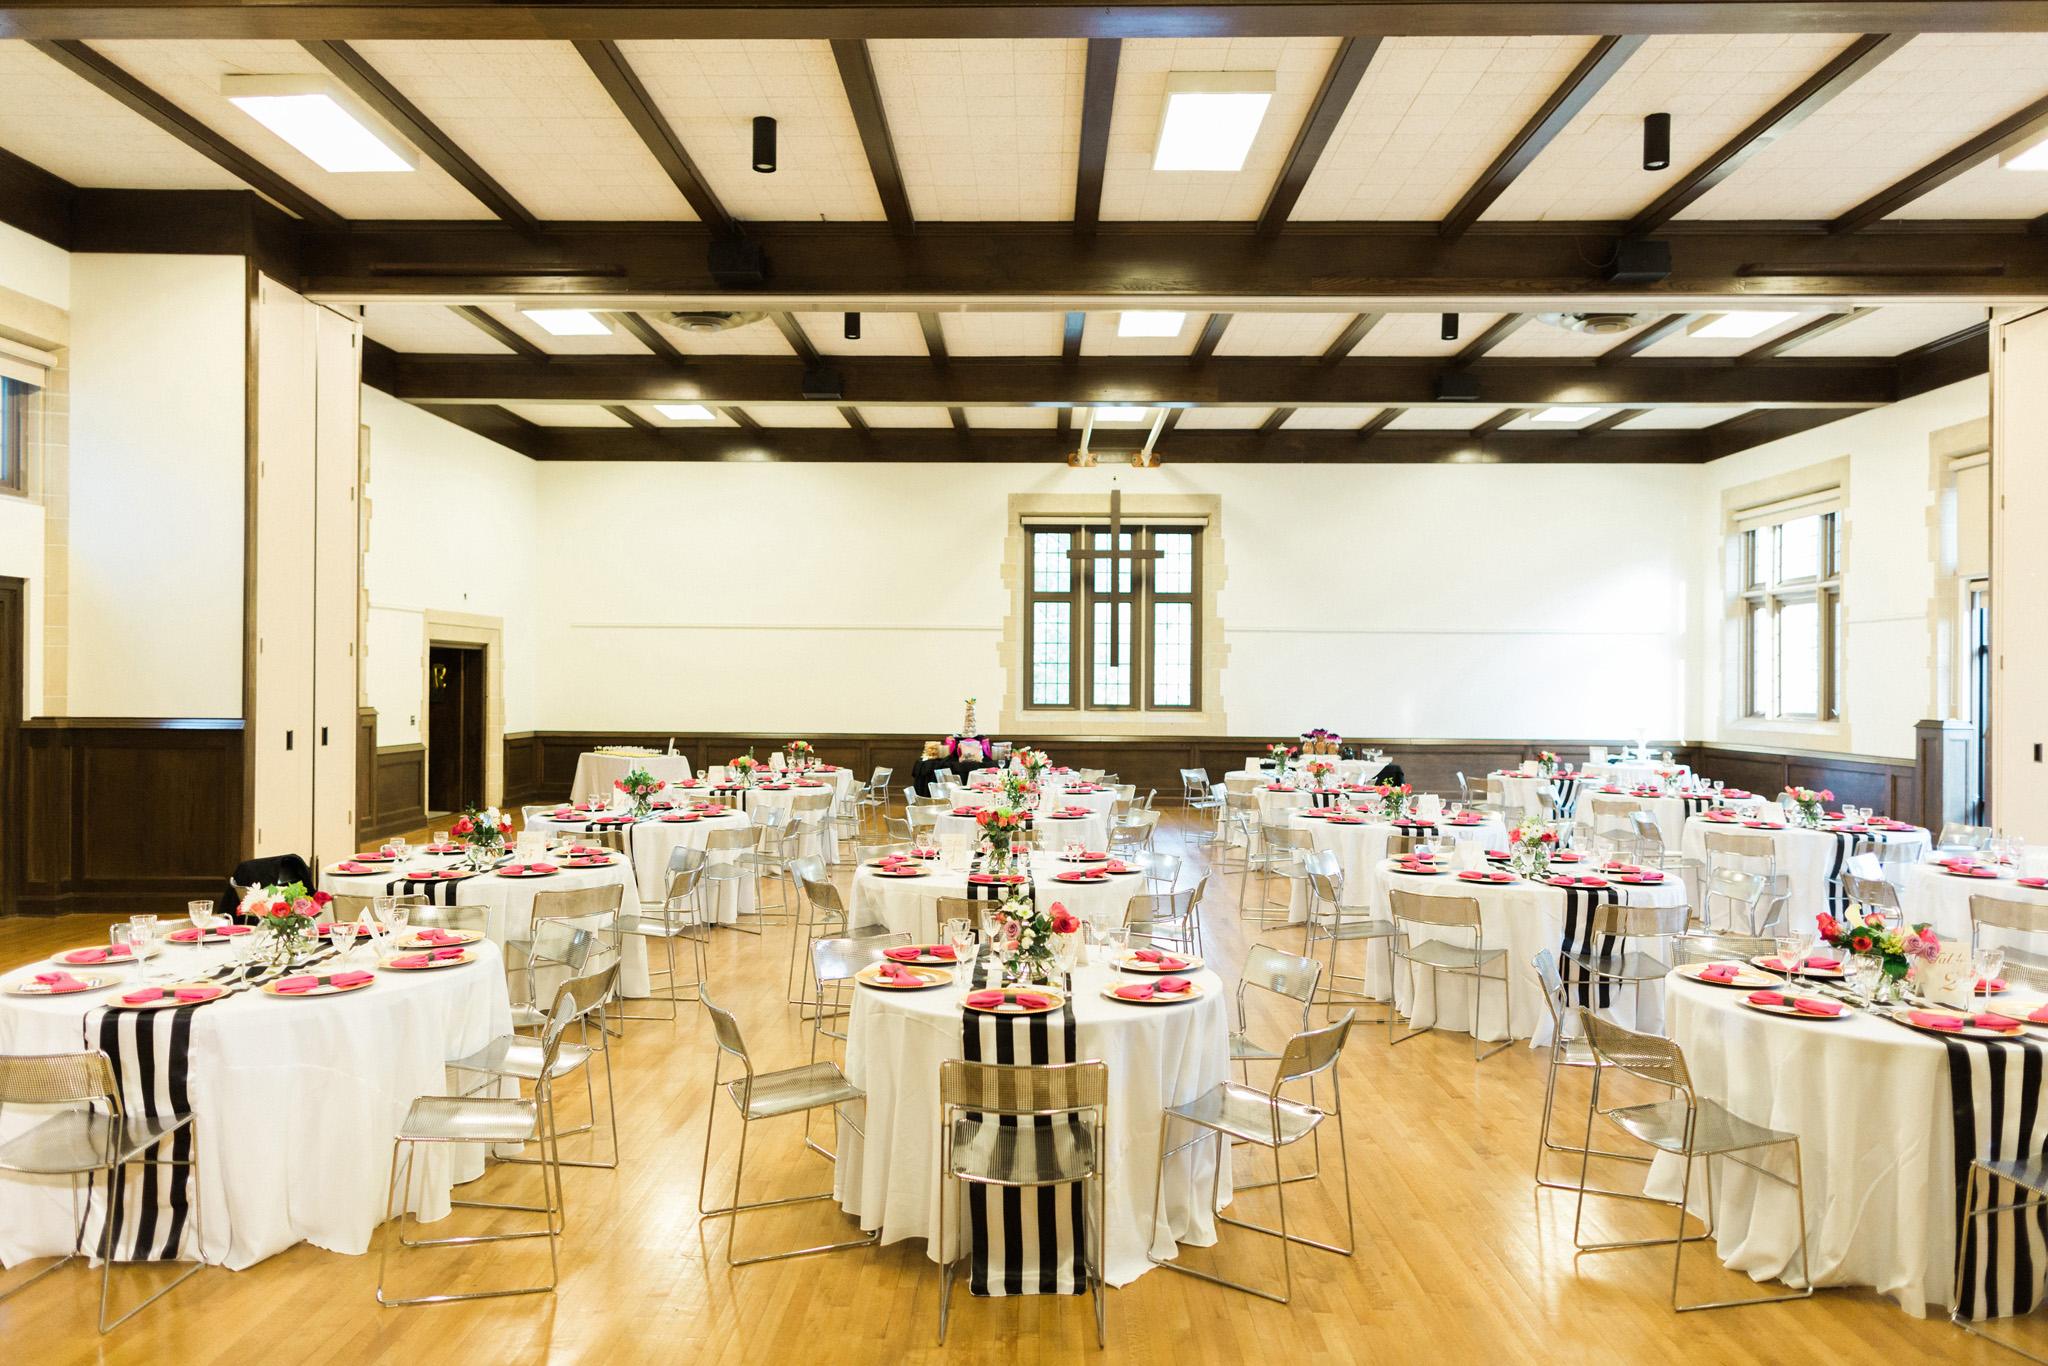 Wedding Reception Venues in Wichita, KS - Best Wichita Wedding ...